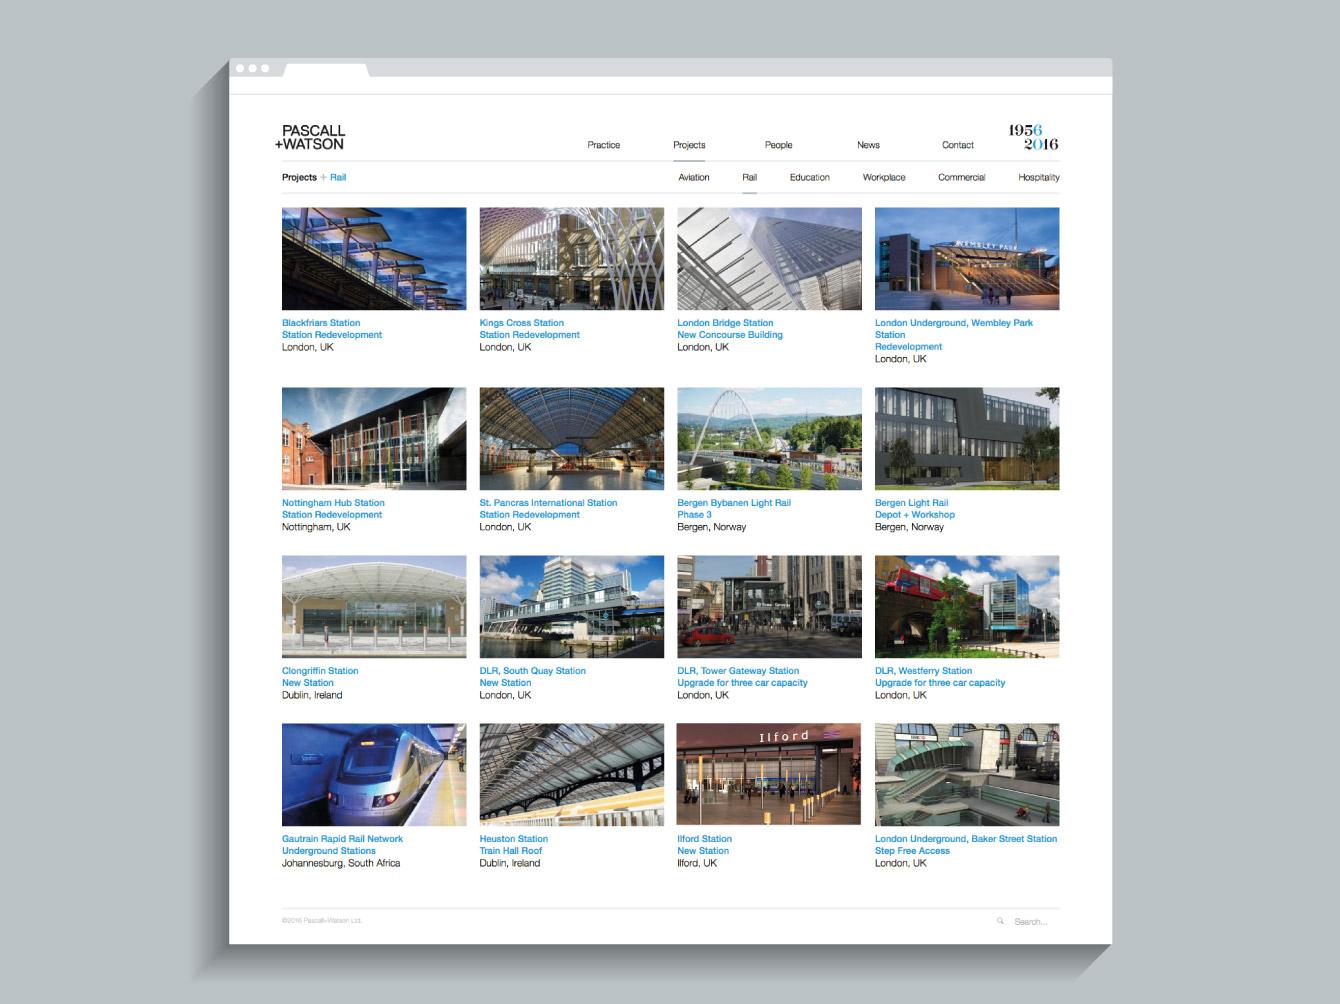 The Rail case studies on the Pascall+Watson website - desktop